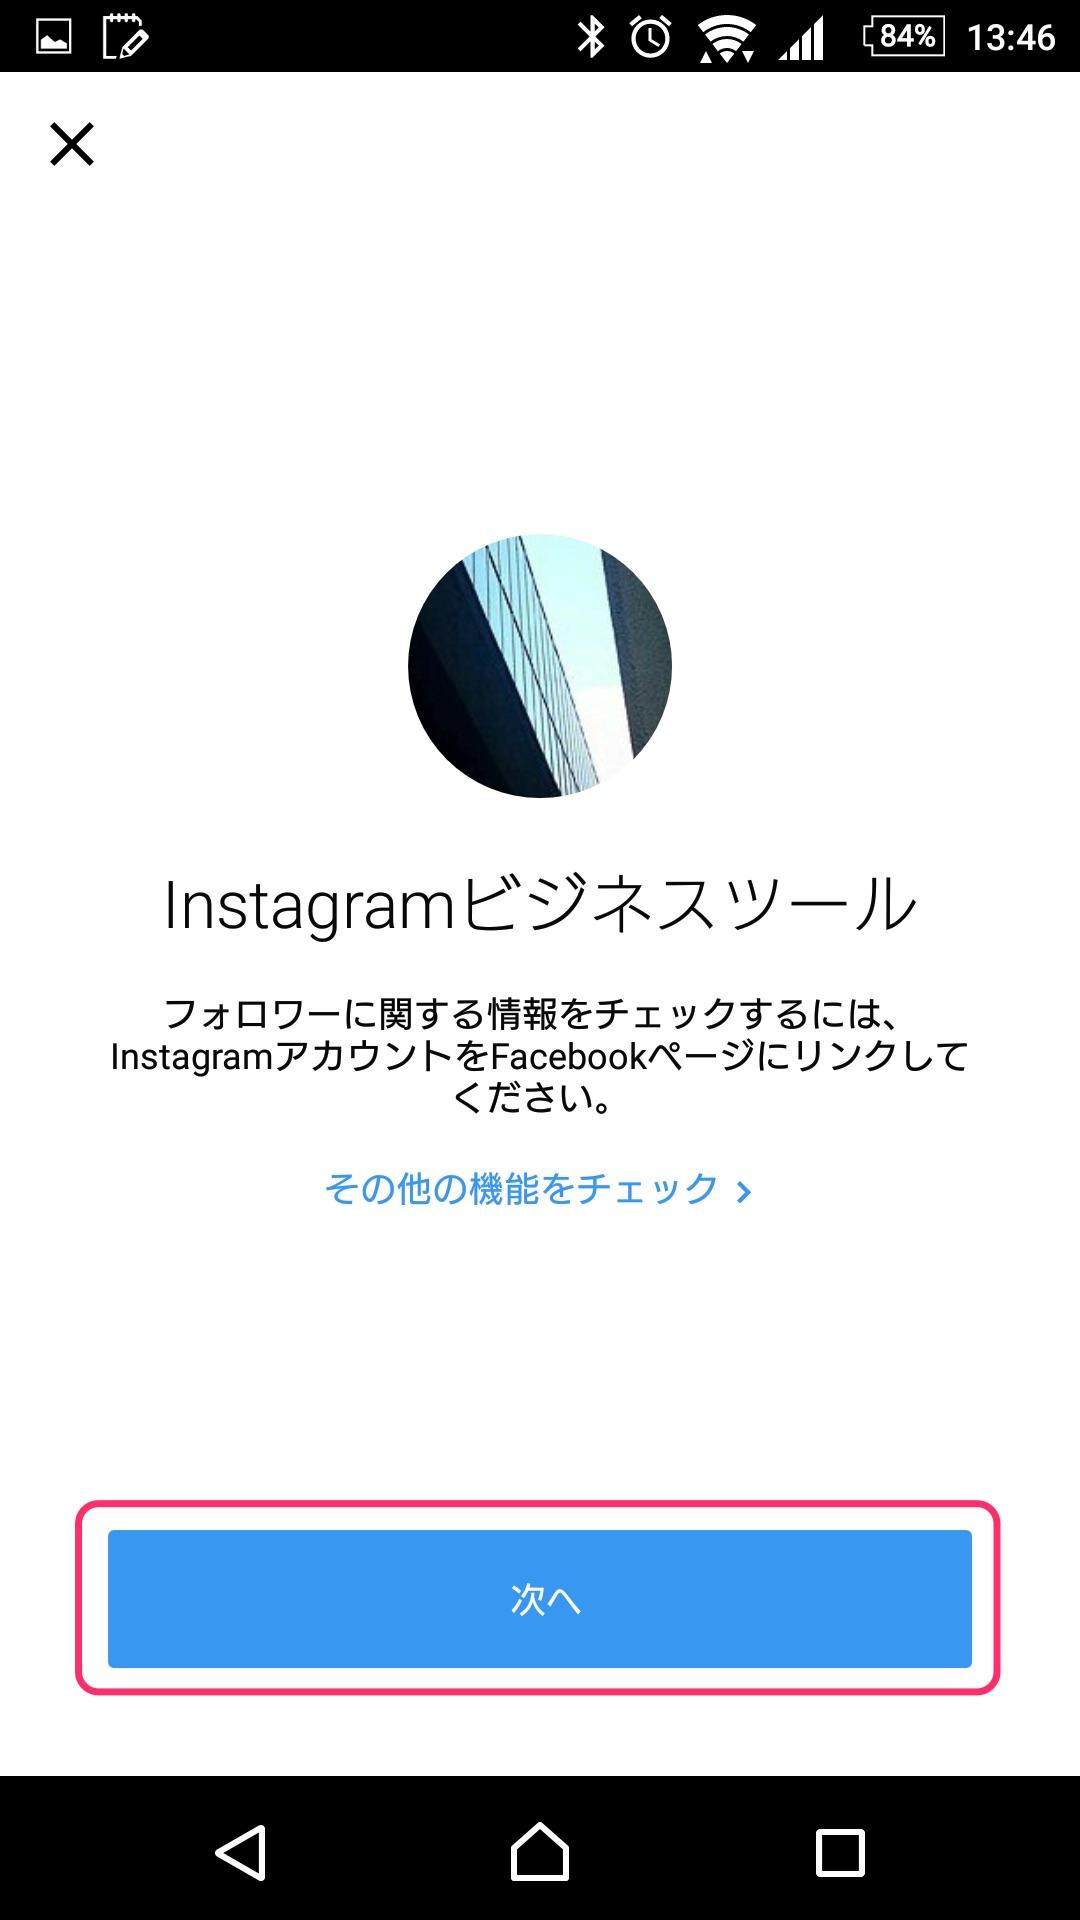 Screenshot 20161115 134641